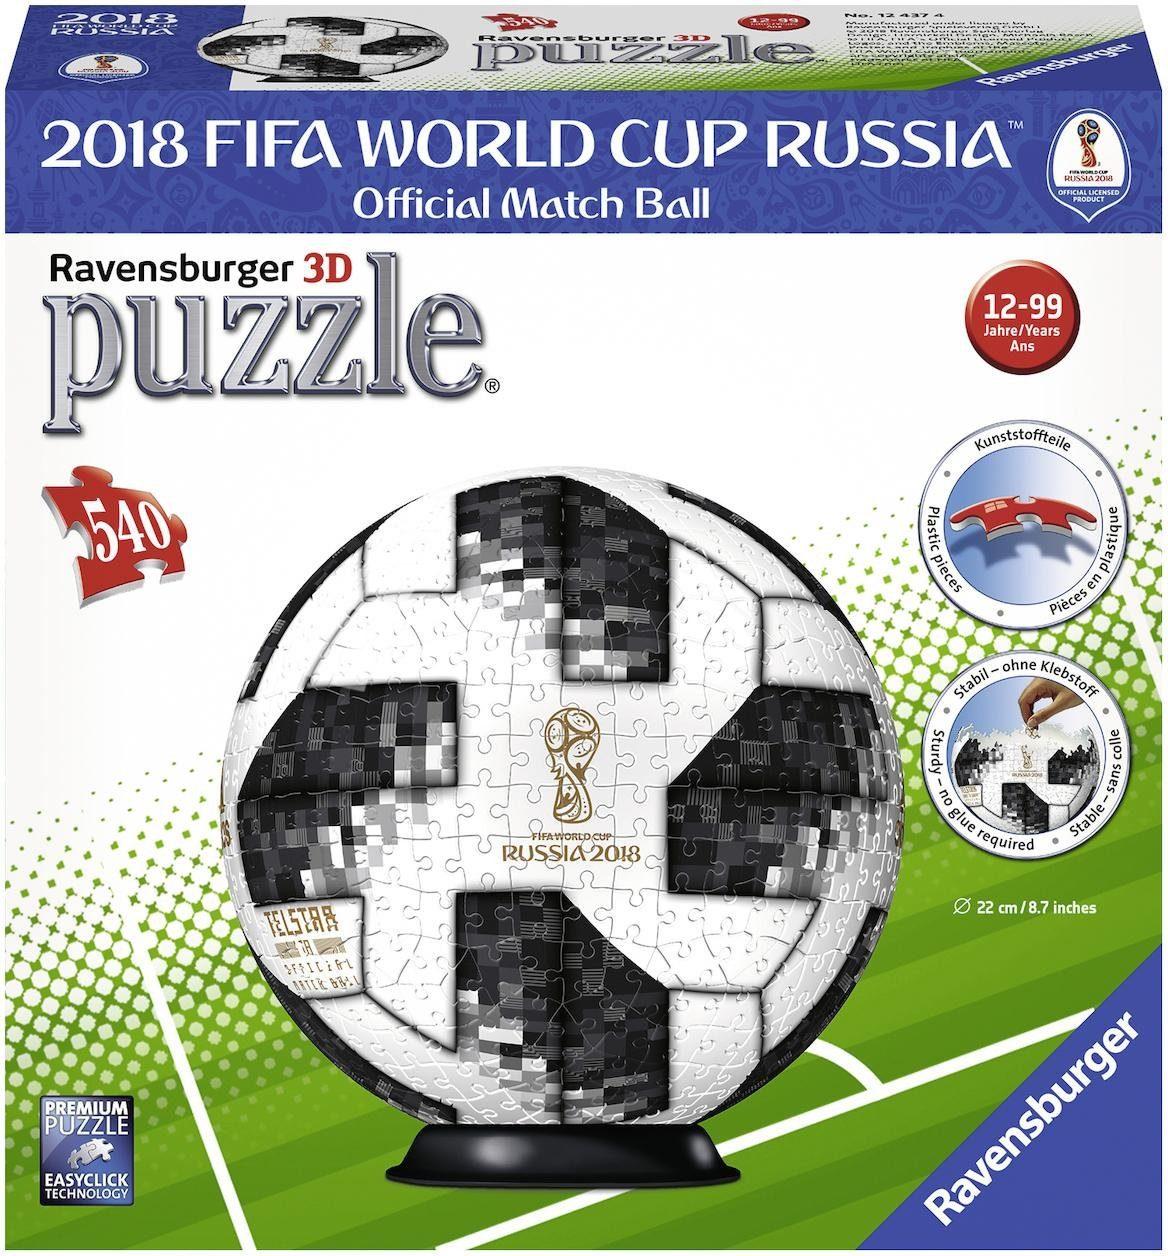 Ravensburger 3D Puzzleball, 540 Teile, »Match Ball 2018 FIFA World Cup«